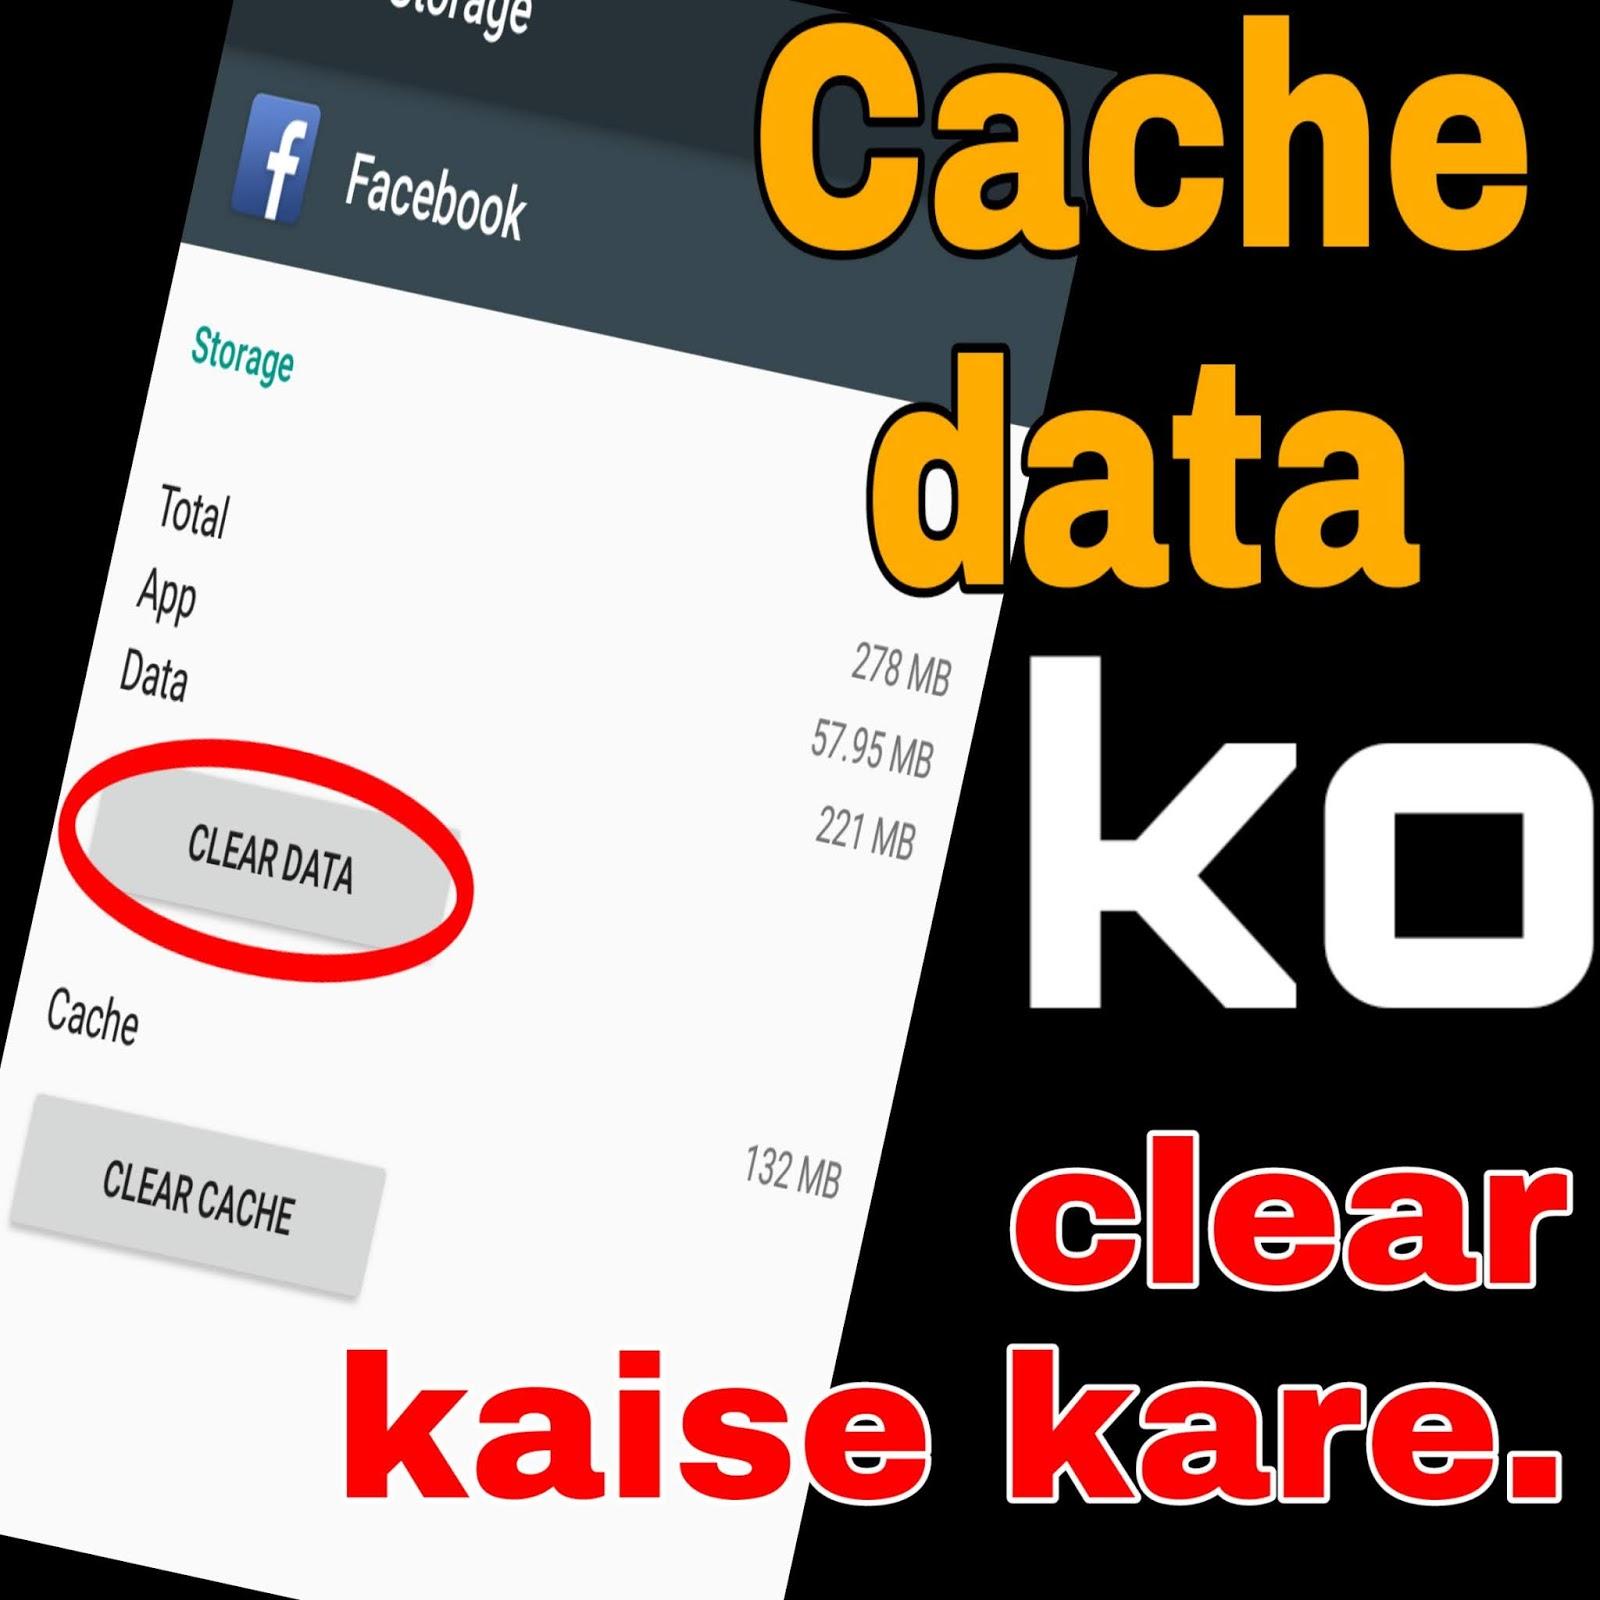 Phone Storege Ko Minto Me Khali Kaise Kare How To Clear Cache